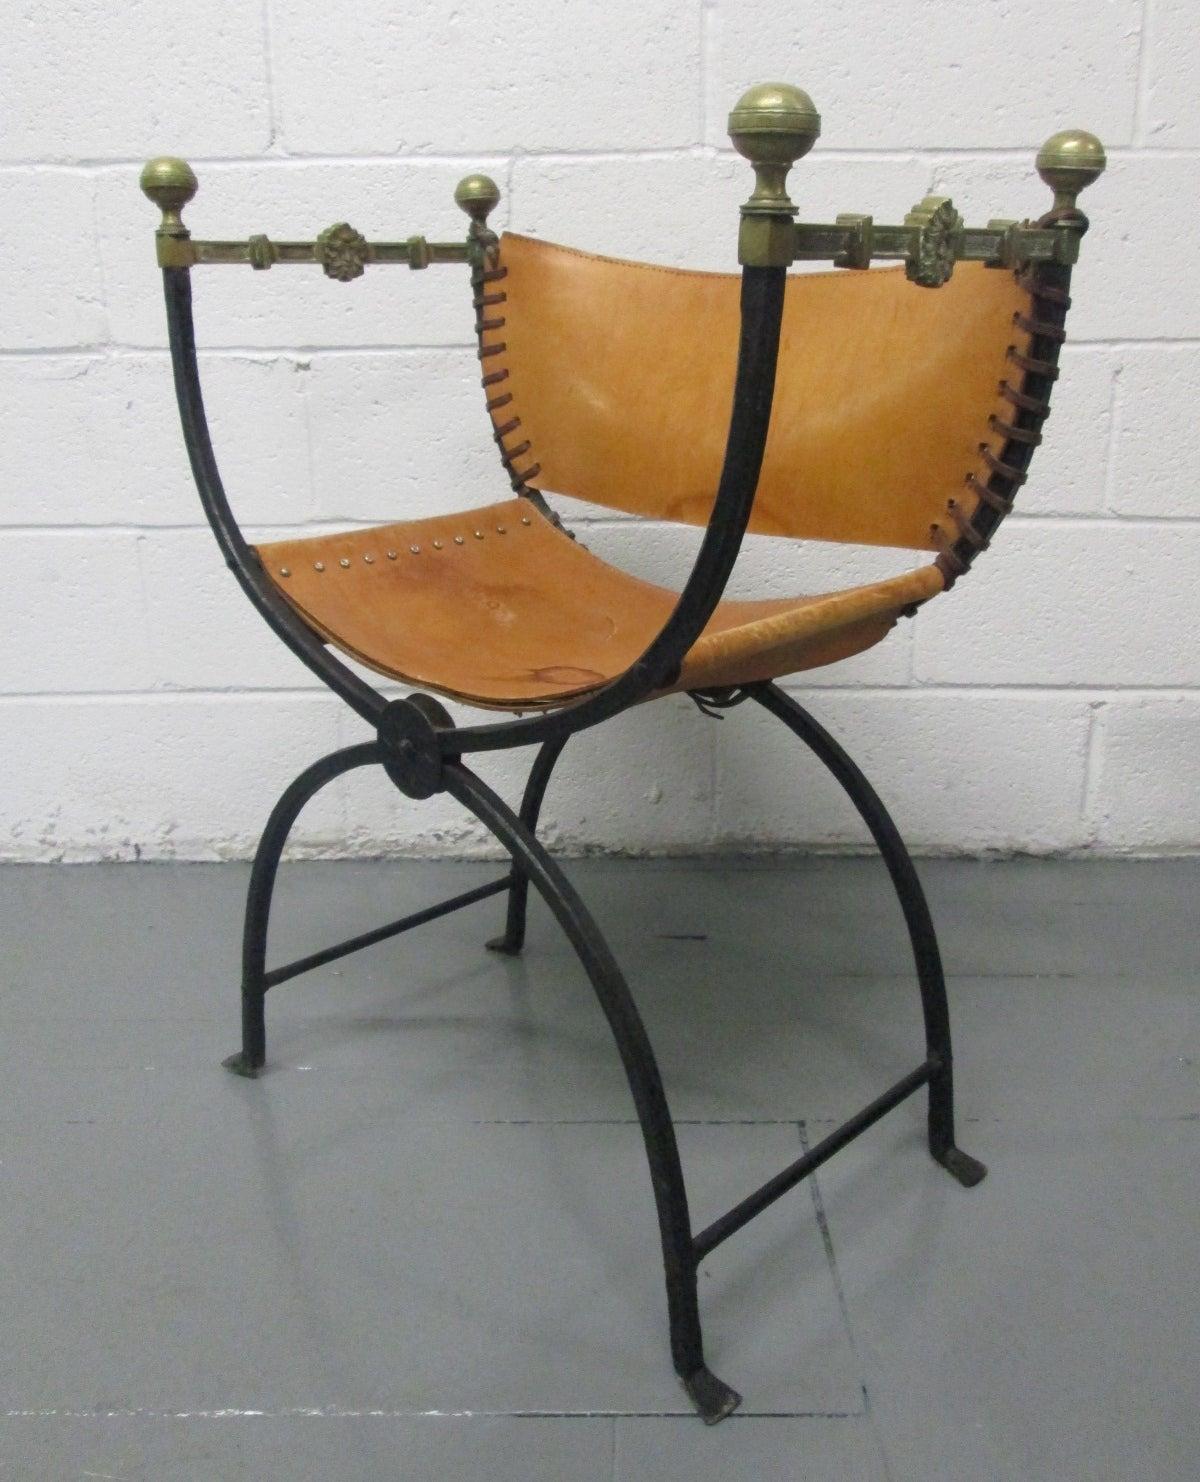 Modern savonarola chair - Italian Curule Savonarola Chair 3